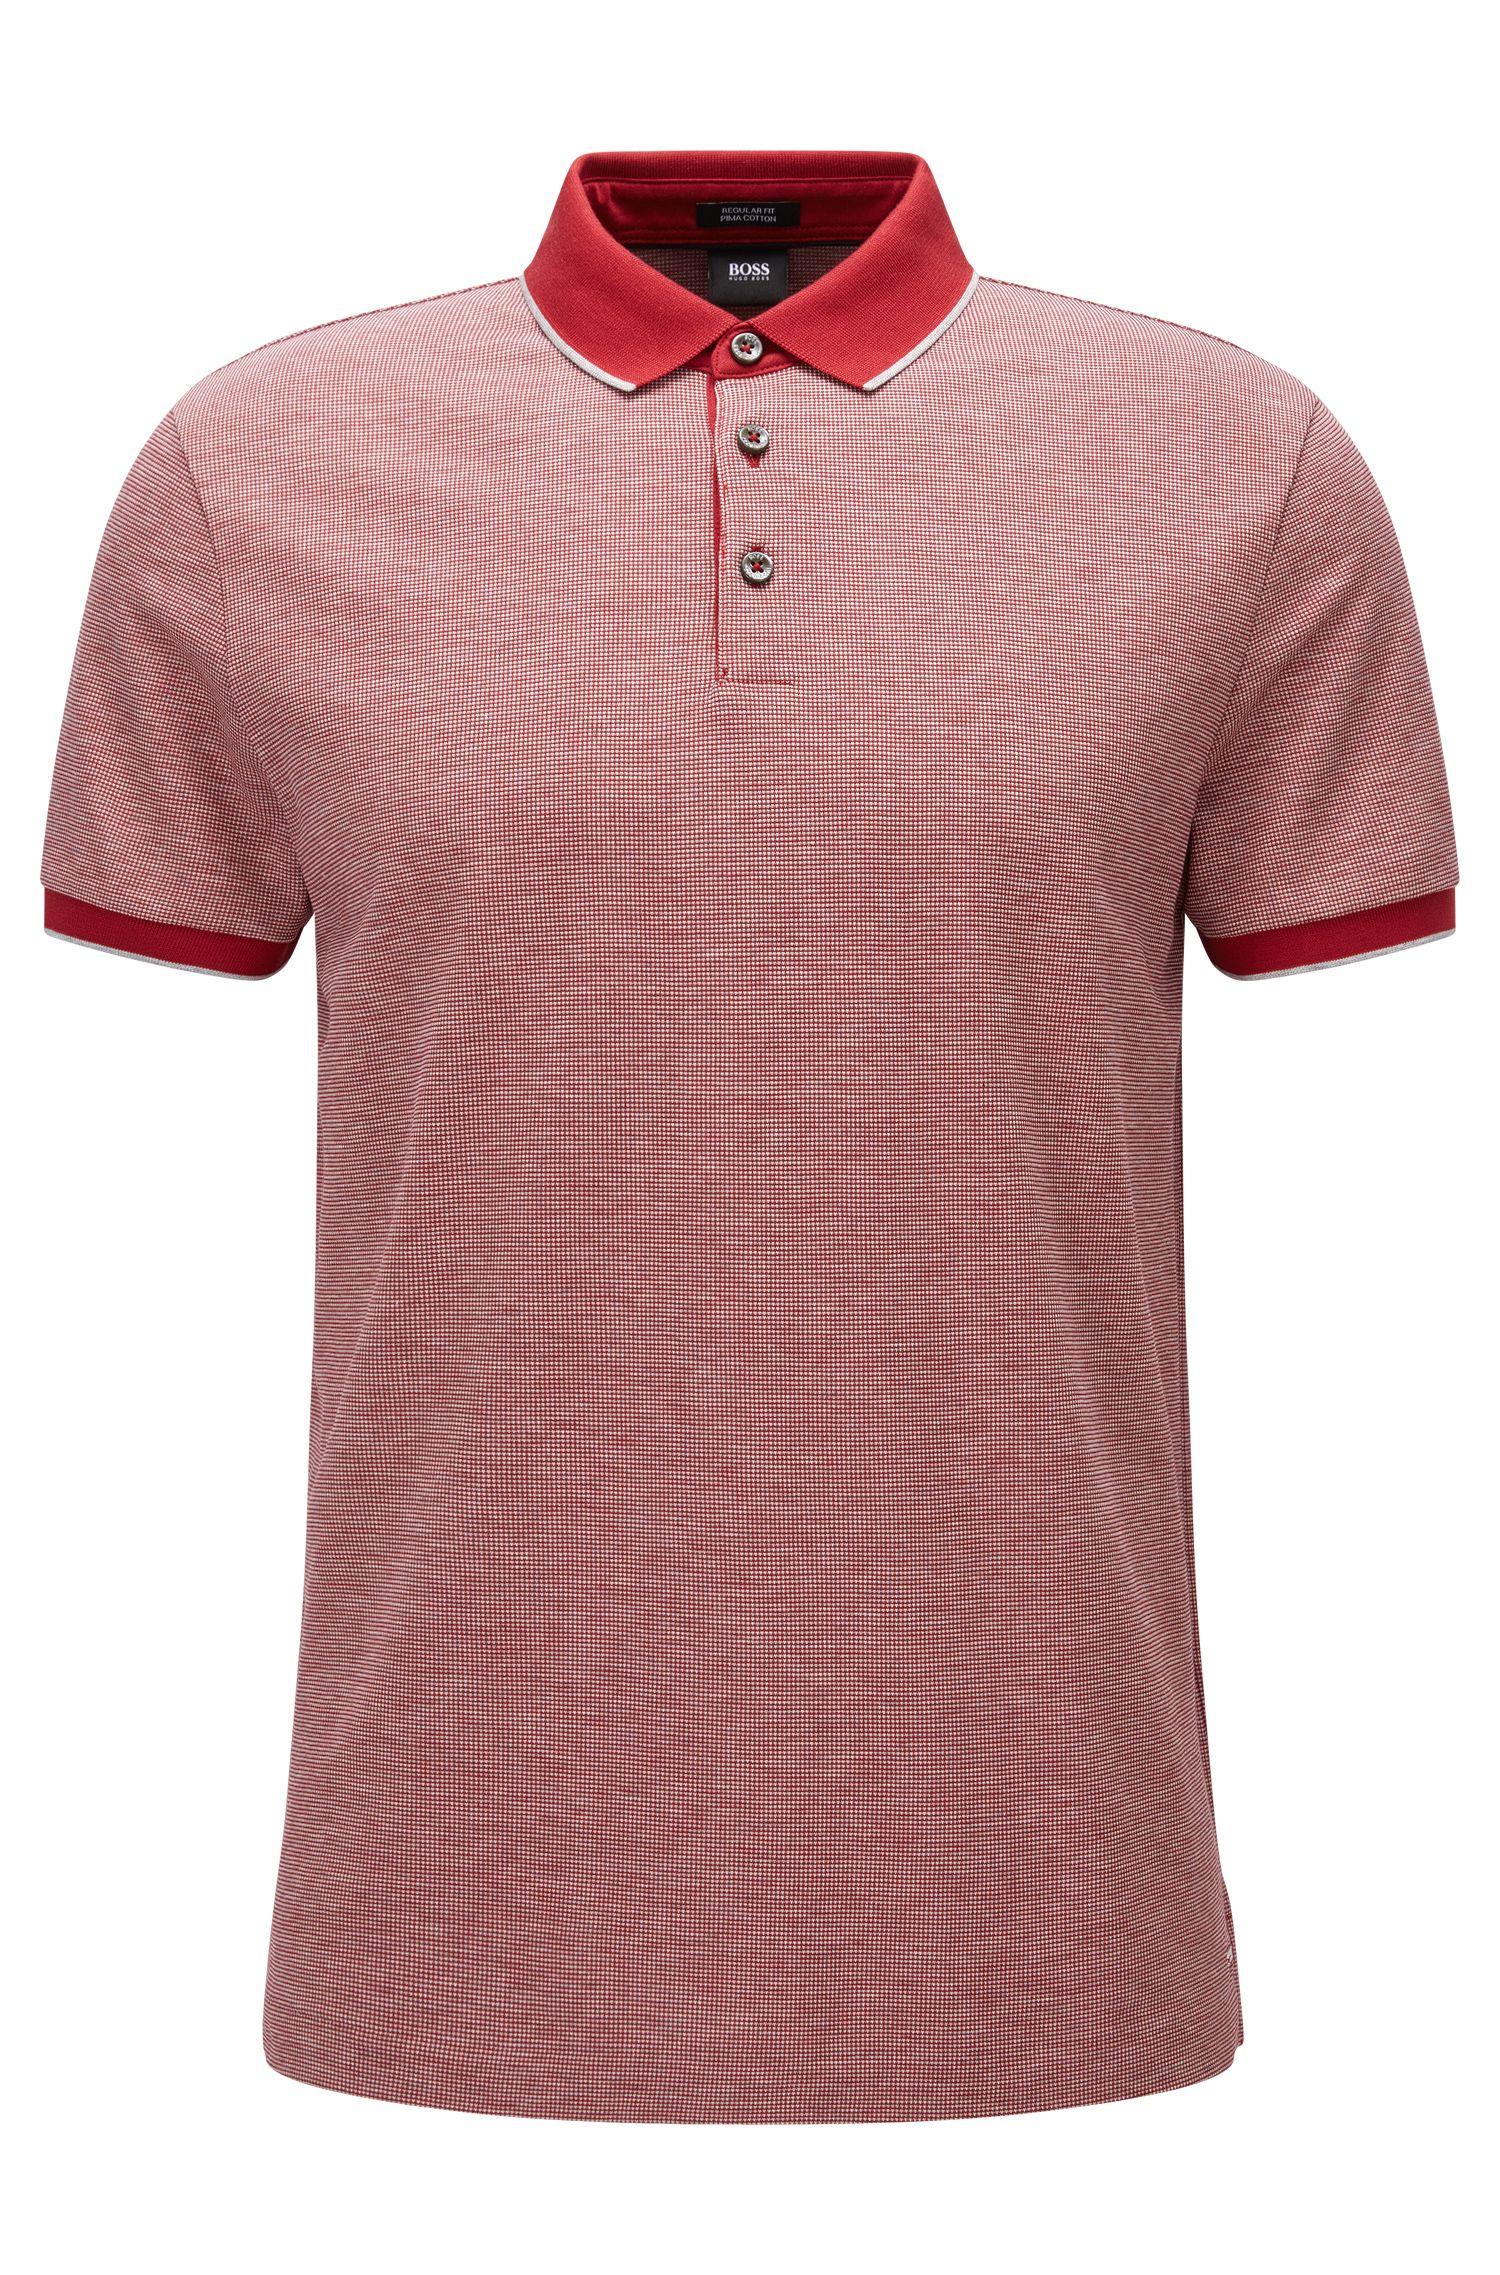 'Pack'   Regular Fit, Birdseye Pima Cotton Polo